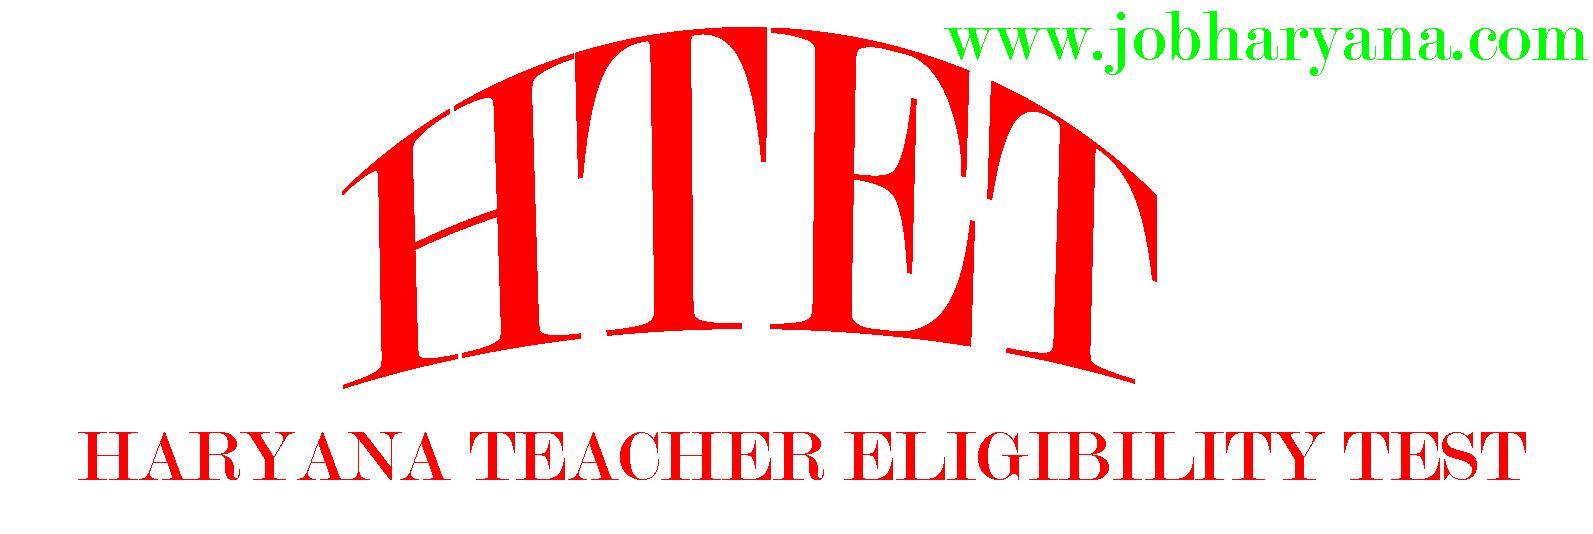 Haryana teacher eligibility test 2012 13 online registration last date date sheet job